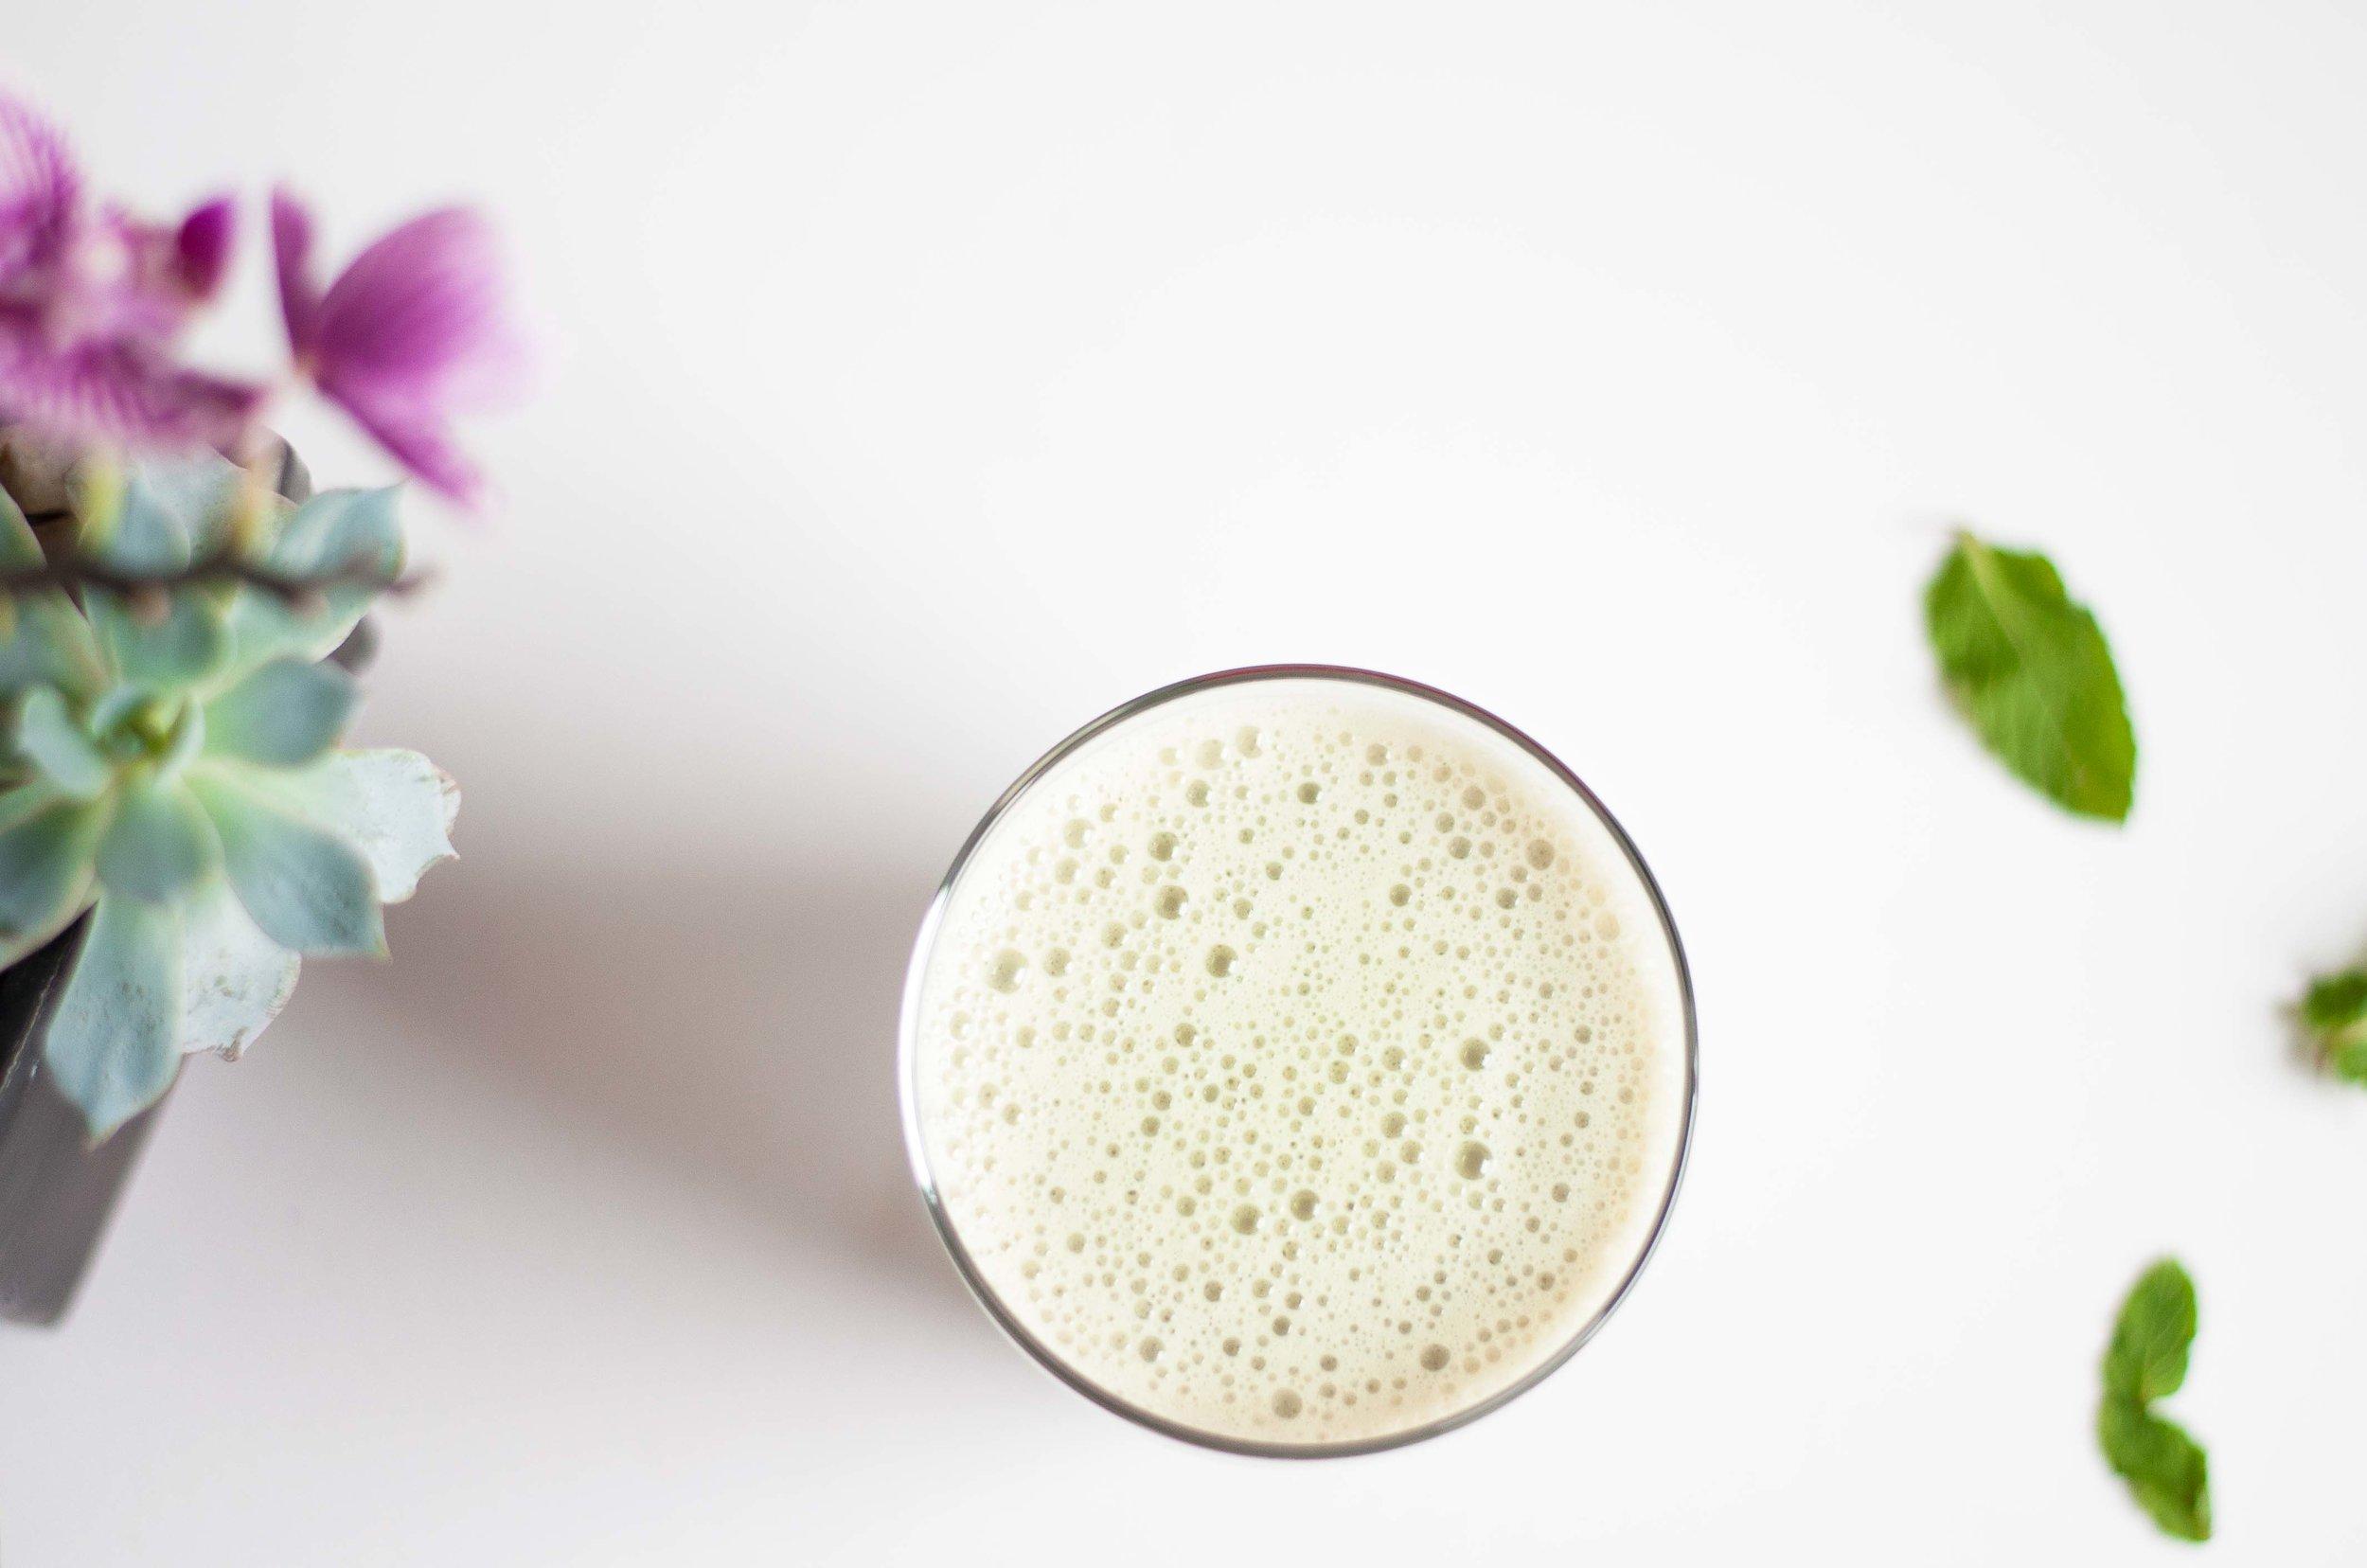 shaken matcha latte - fried parsley